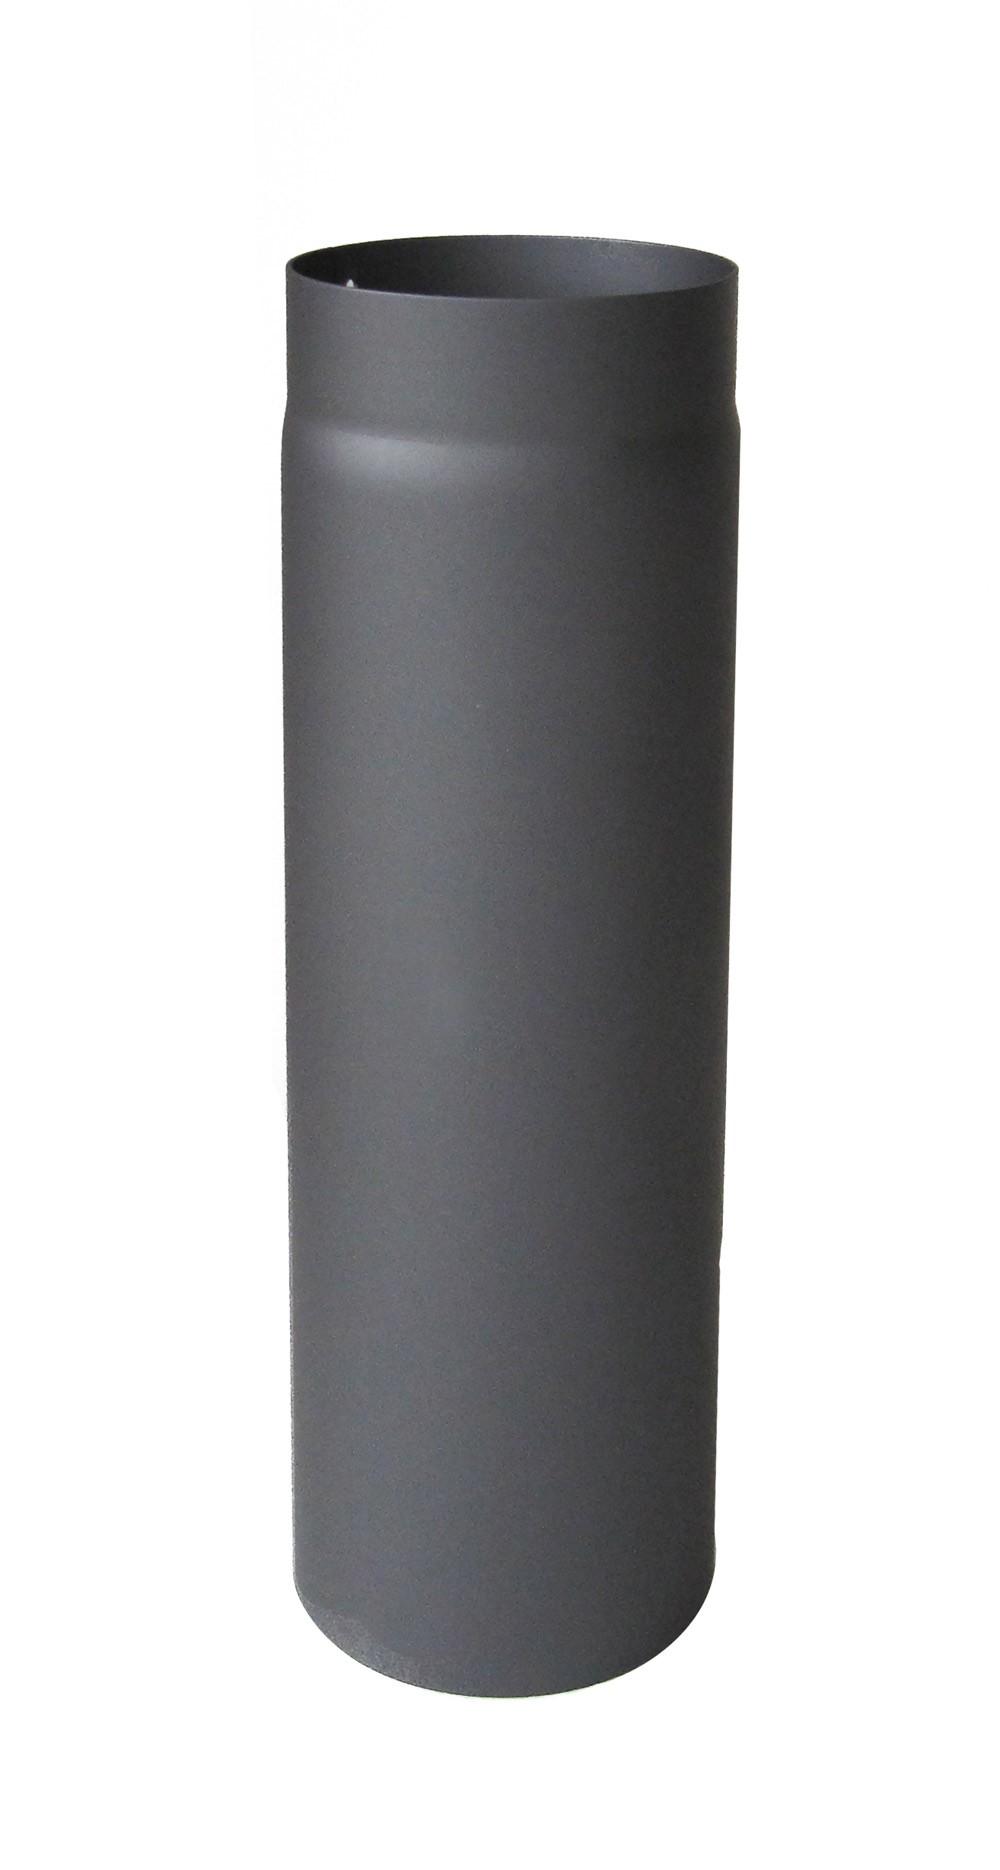 Ofenrohr / Rauchrohr Senotherm gussgrau Ø150 mm Länge 750 mm Bild 2